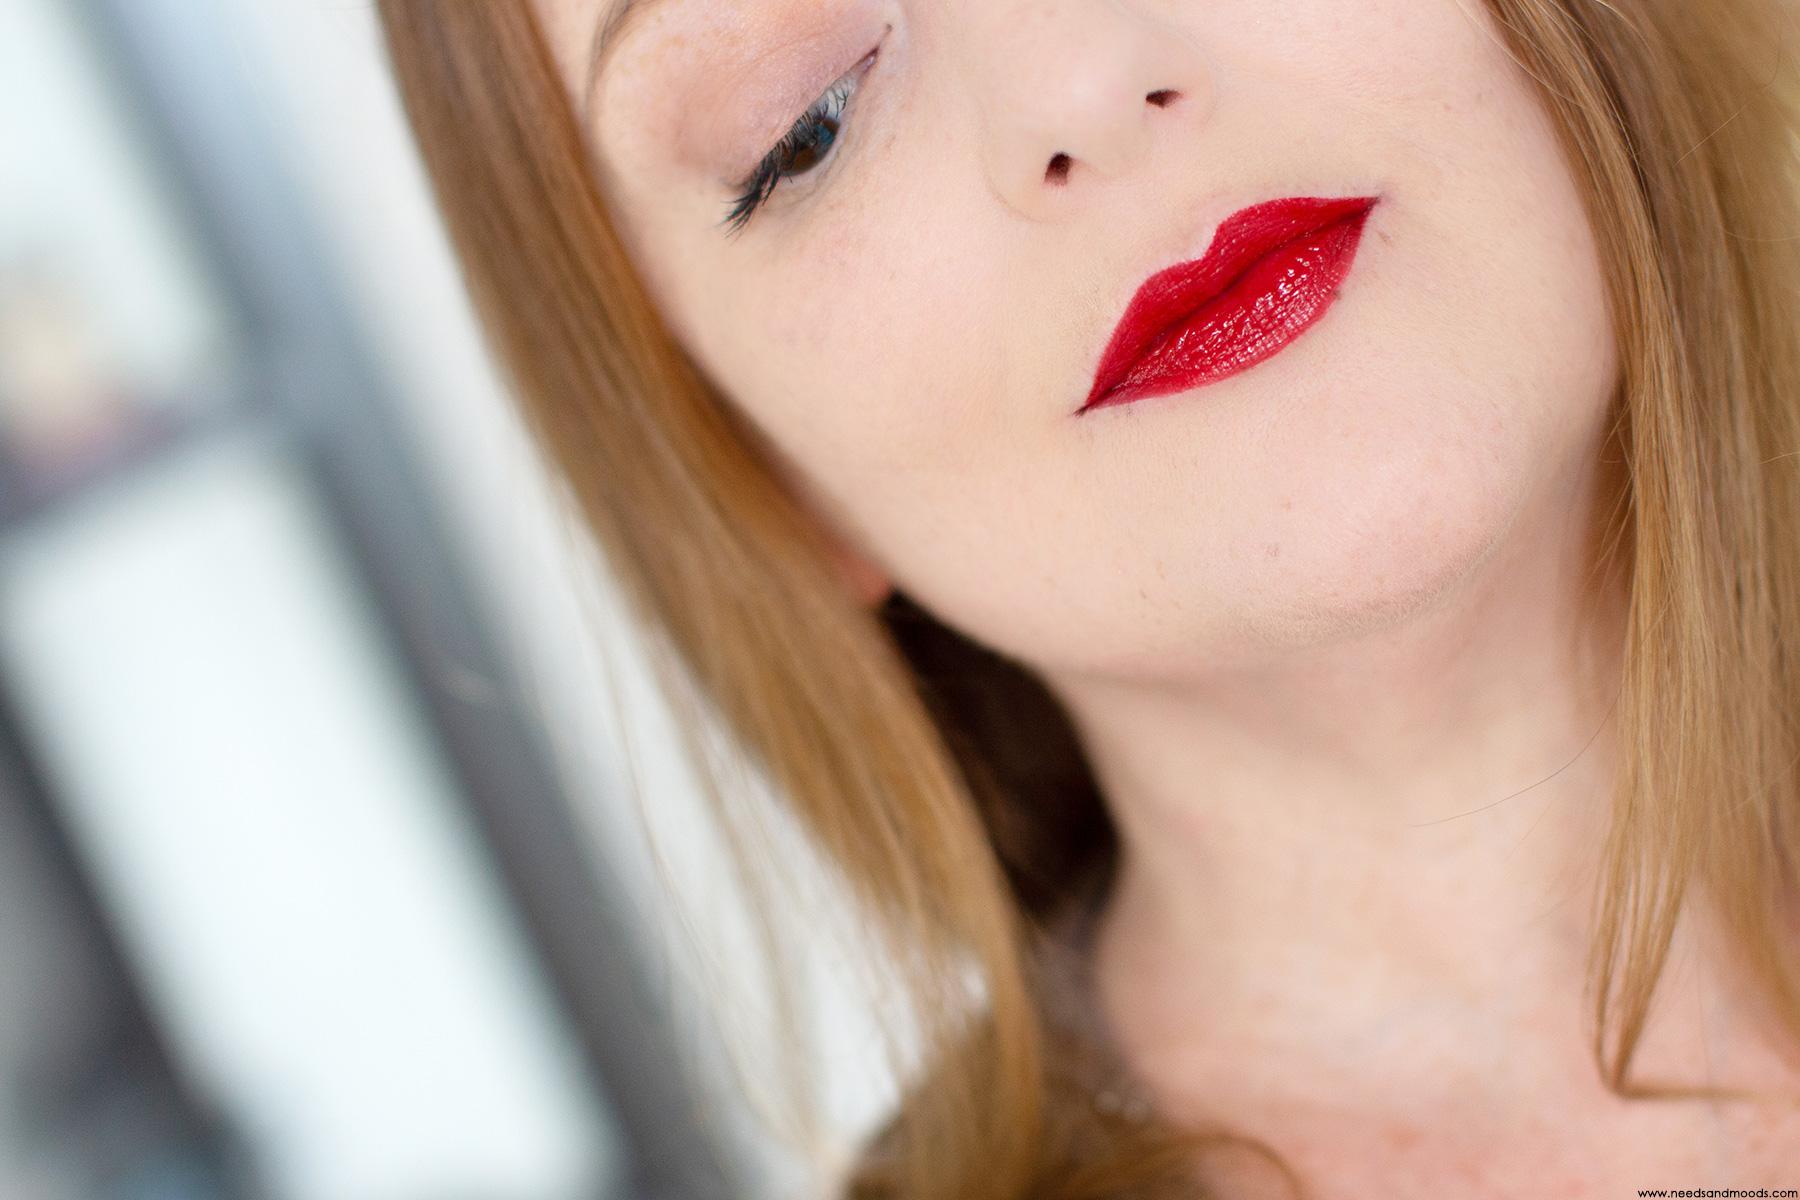 sephora cream lip shine redpotion swatch